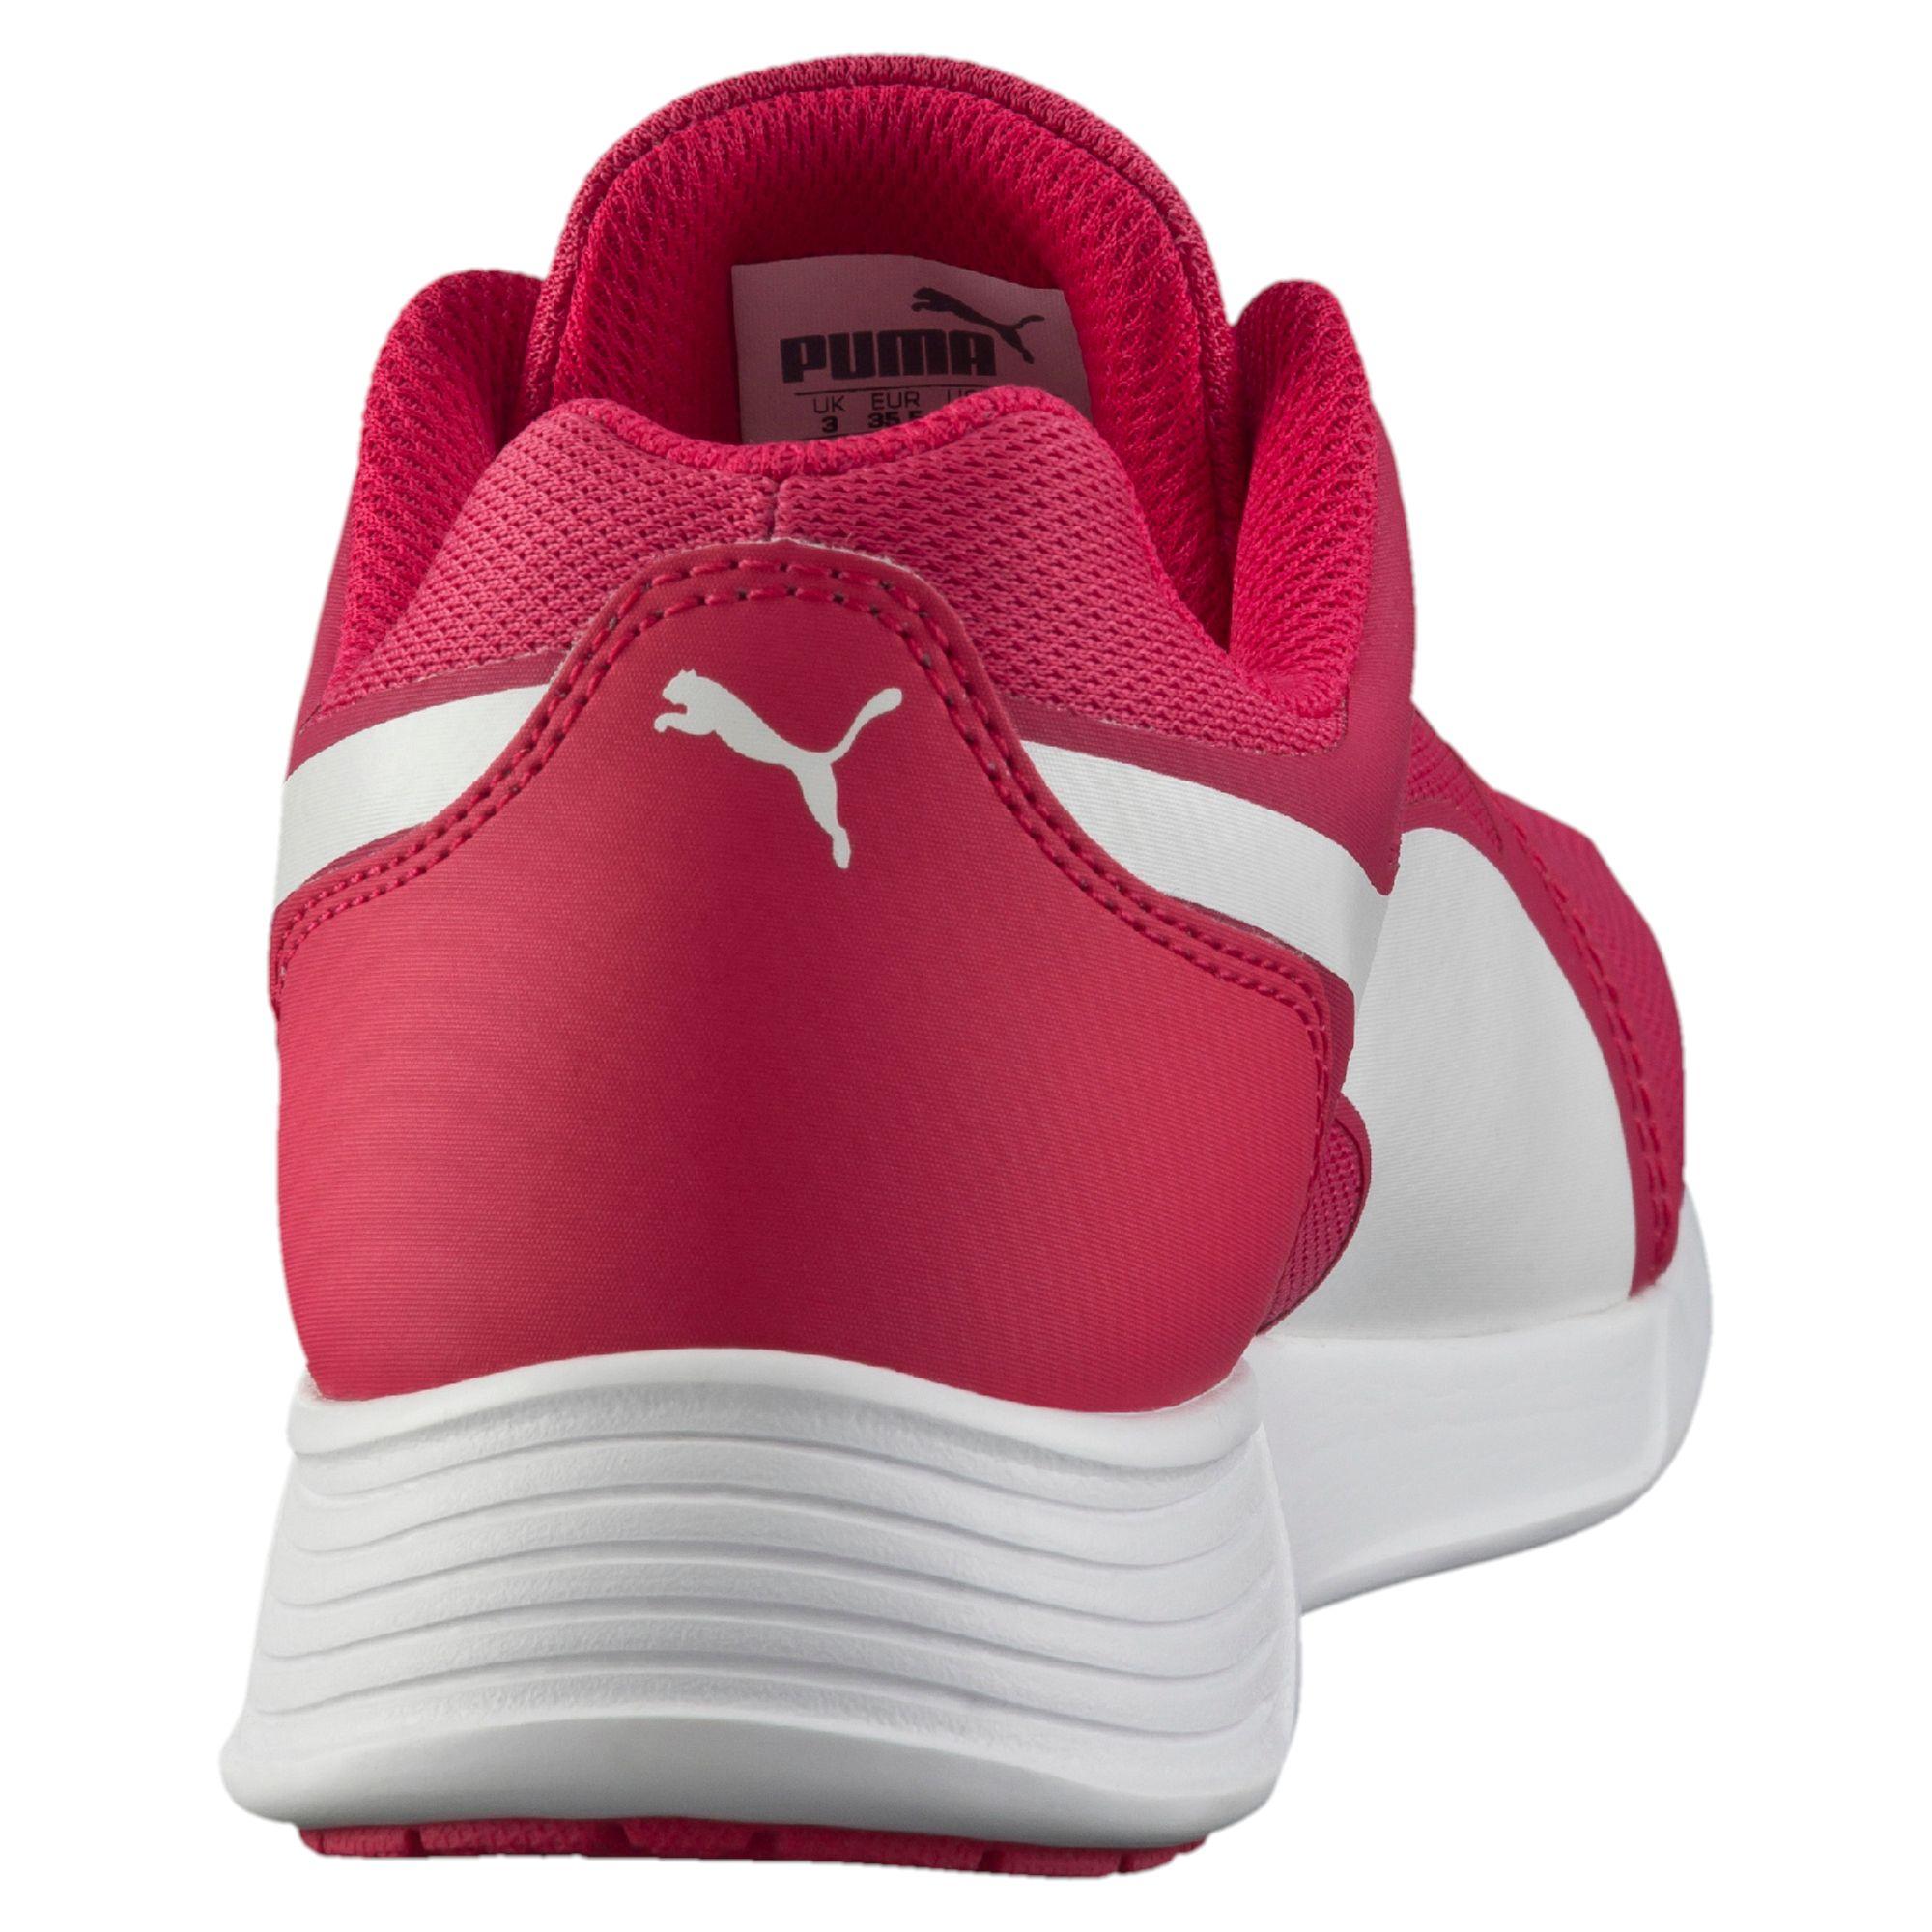 PUMA ST Trainer Evo Trainers Unisex Zapatos Basics Nuevo